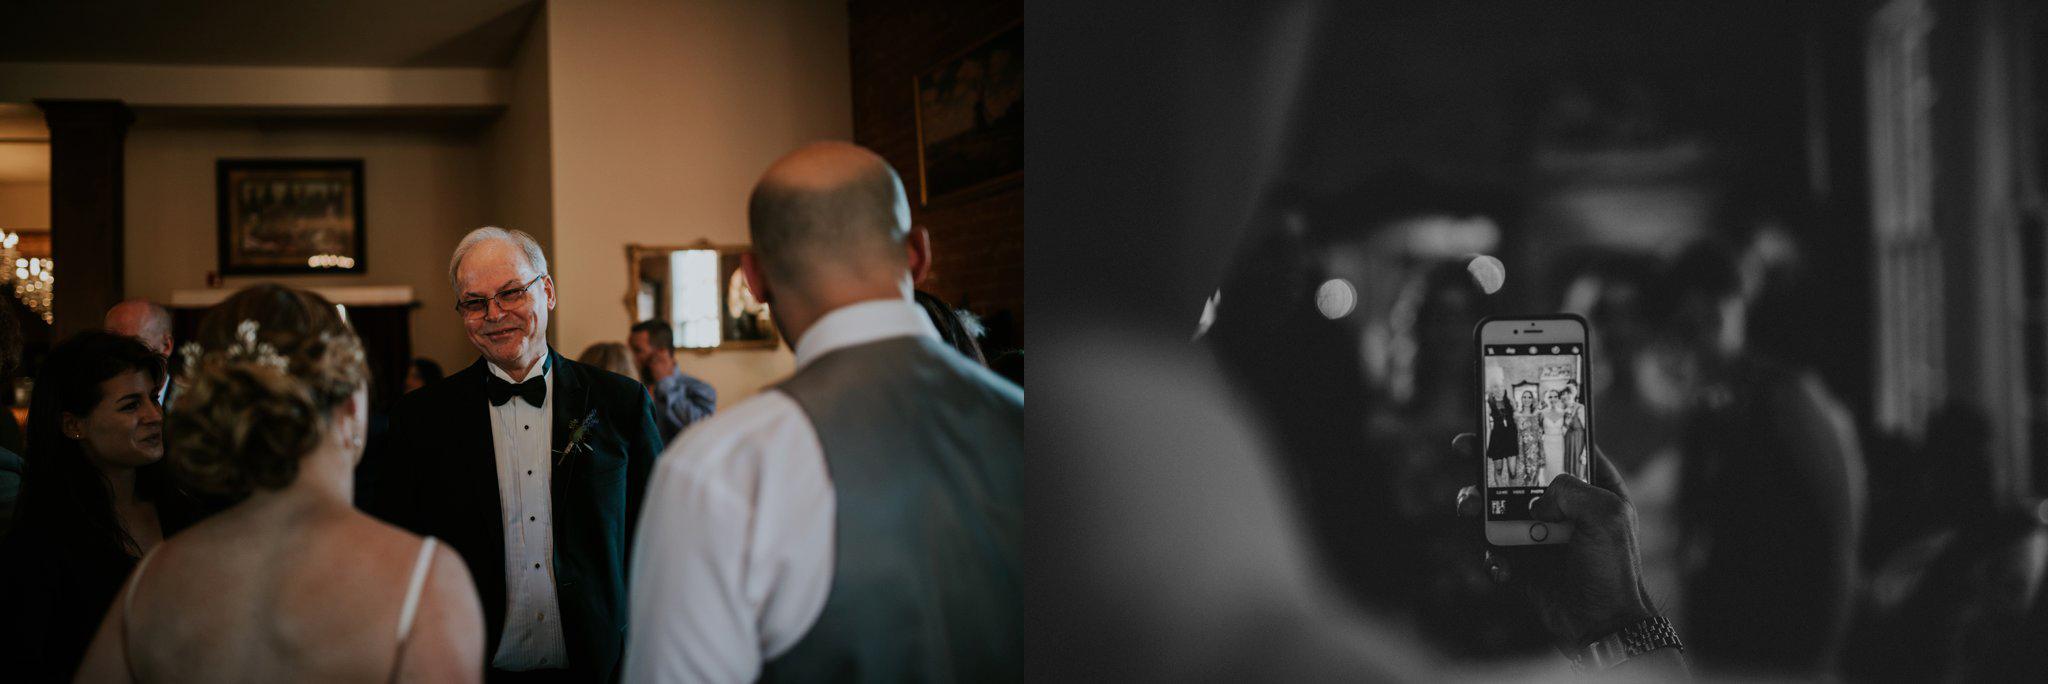 hollywood-school-house-wedding-seattle-photographer-caitlyn-nikula-94.jpg